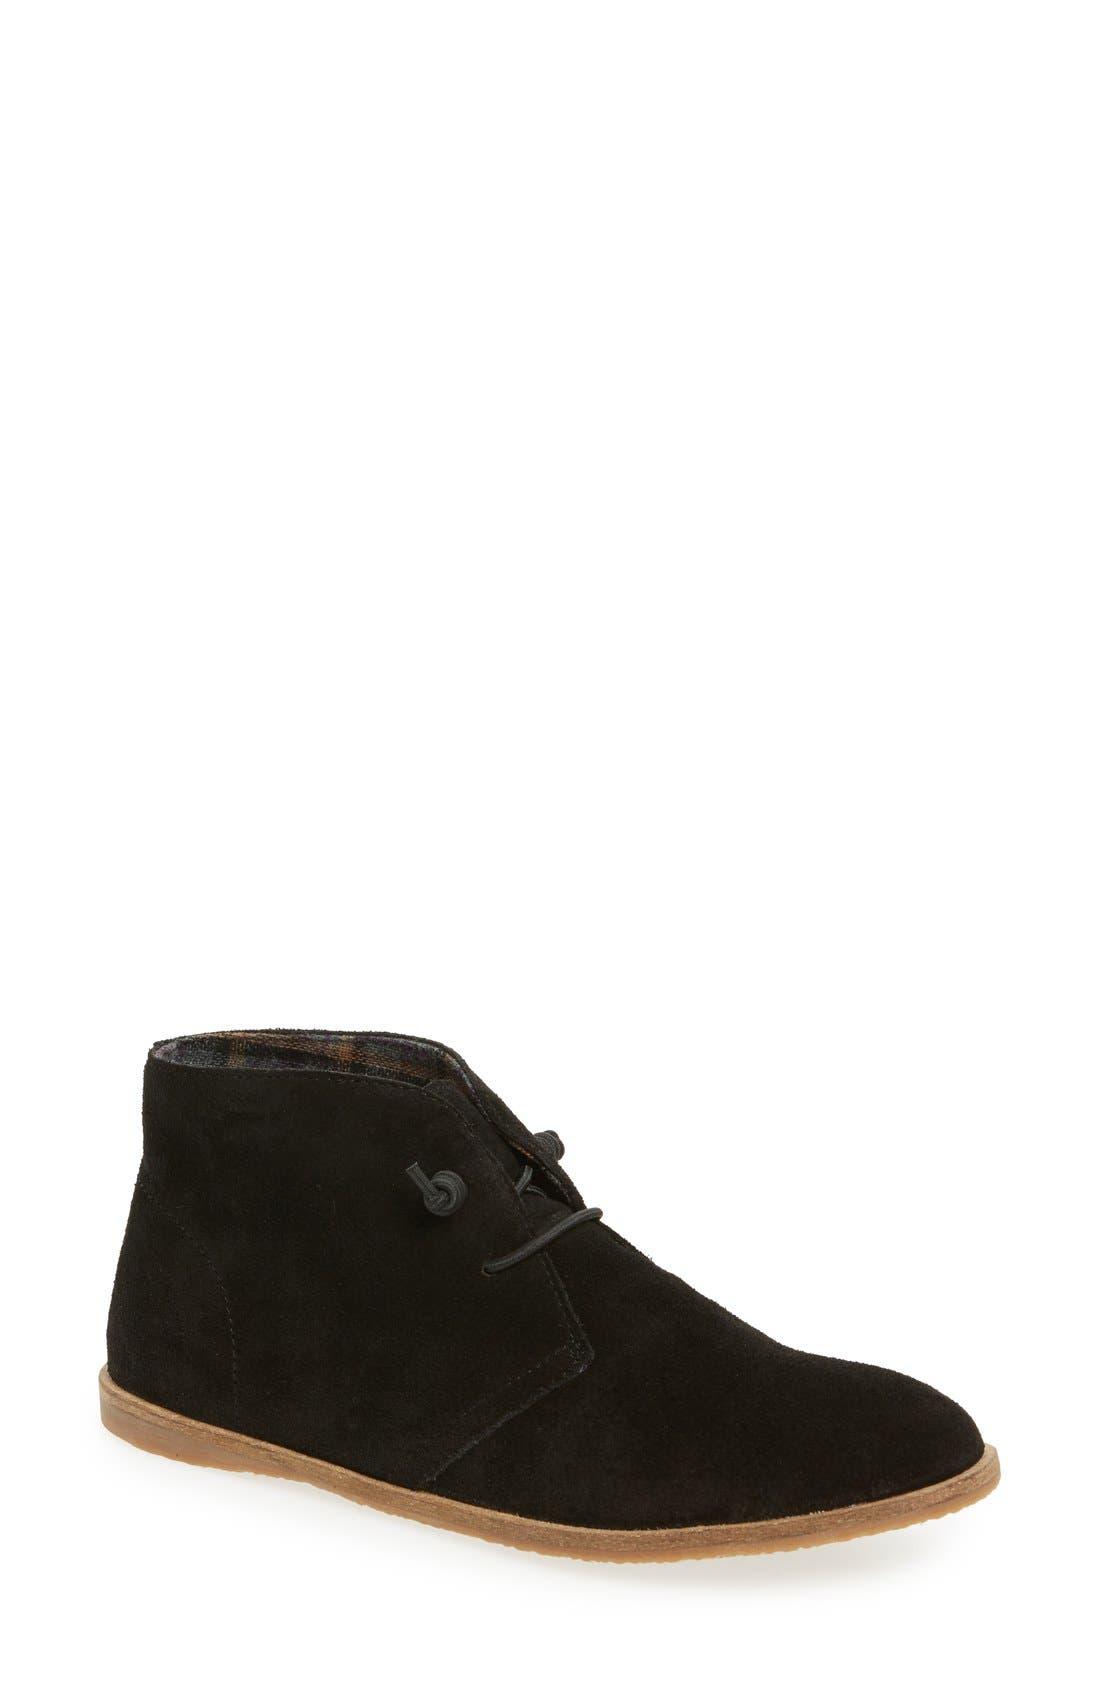 Main Image - Lucky Brand 'Ashbee' Chukka Boot (Women)